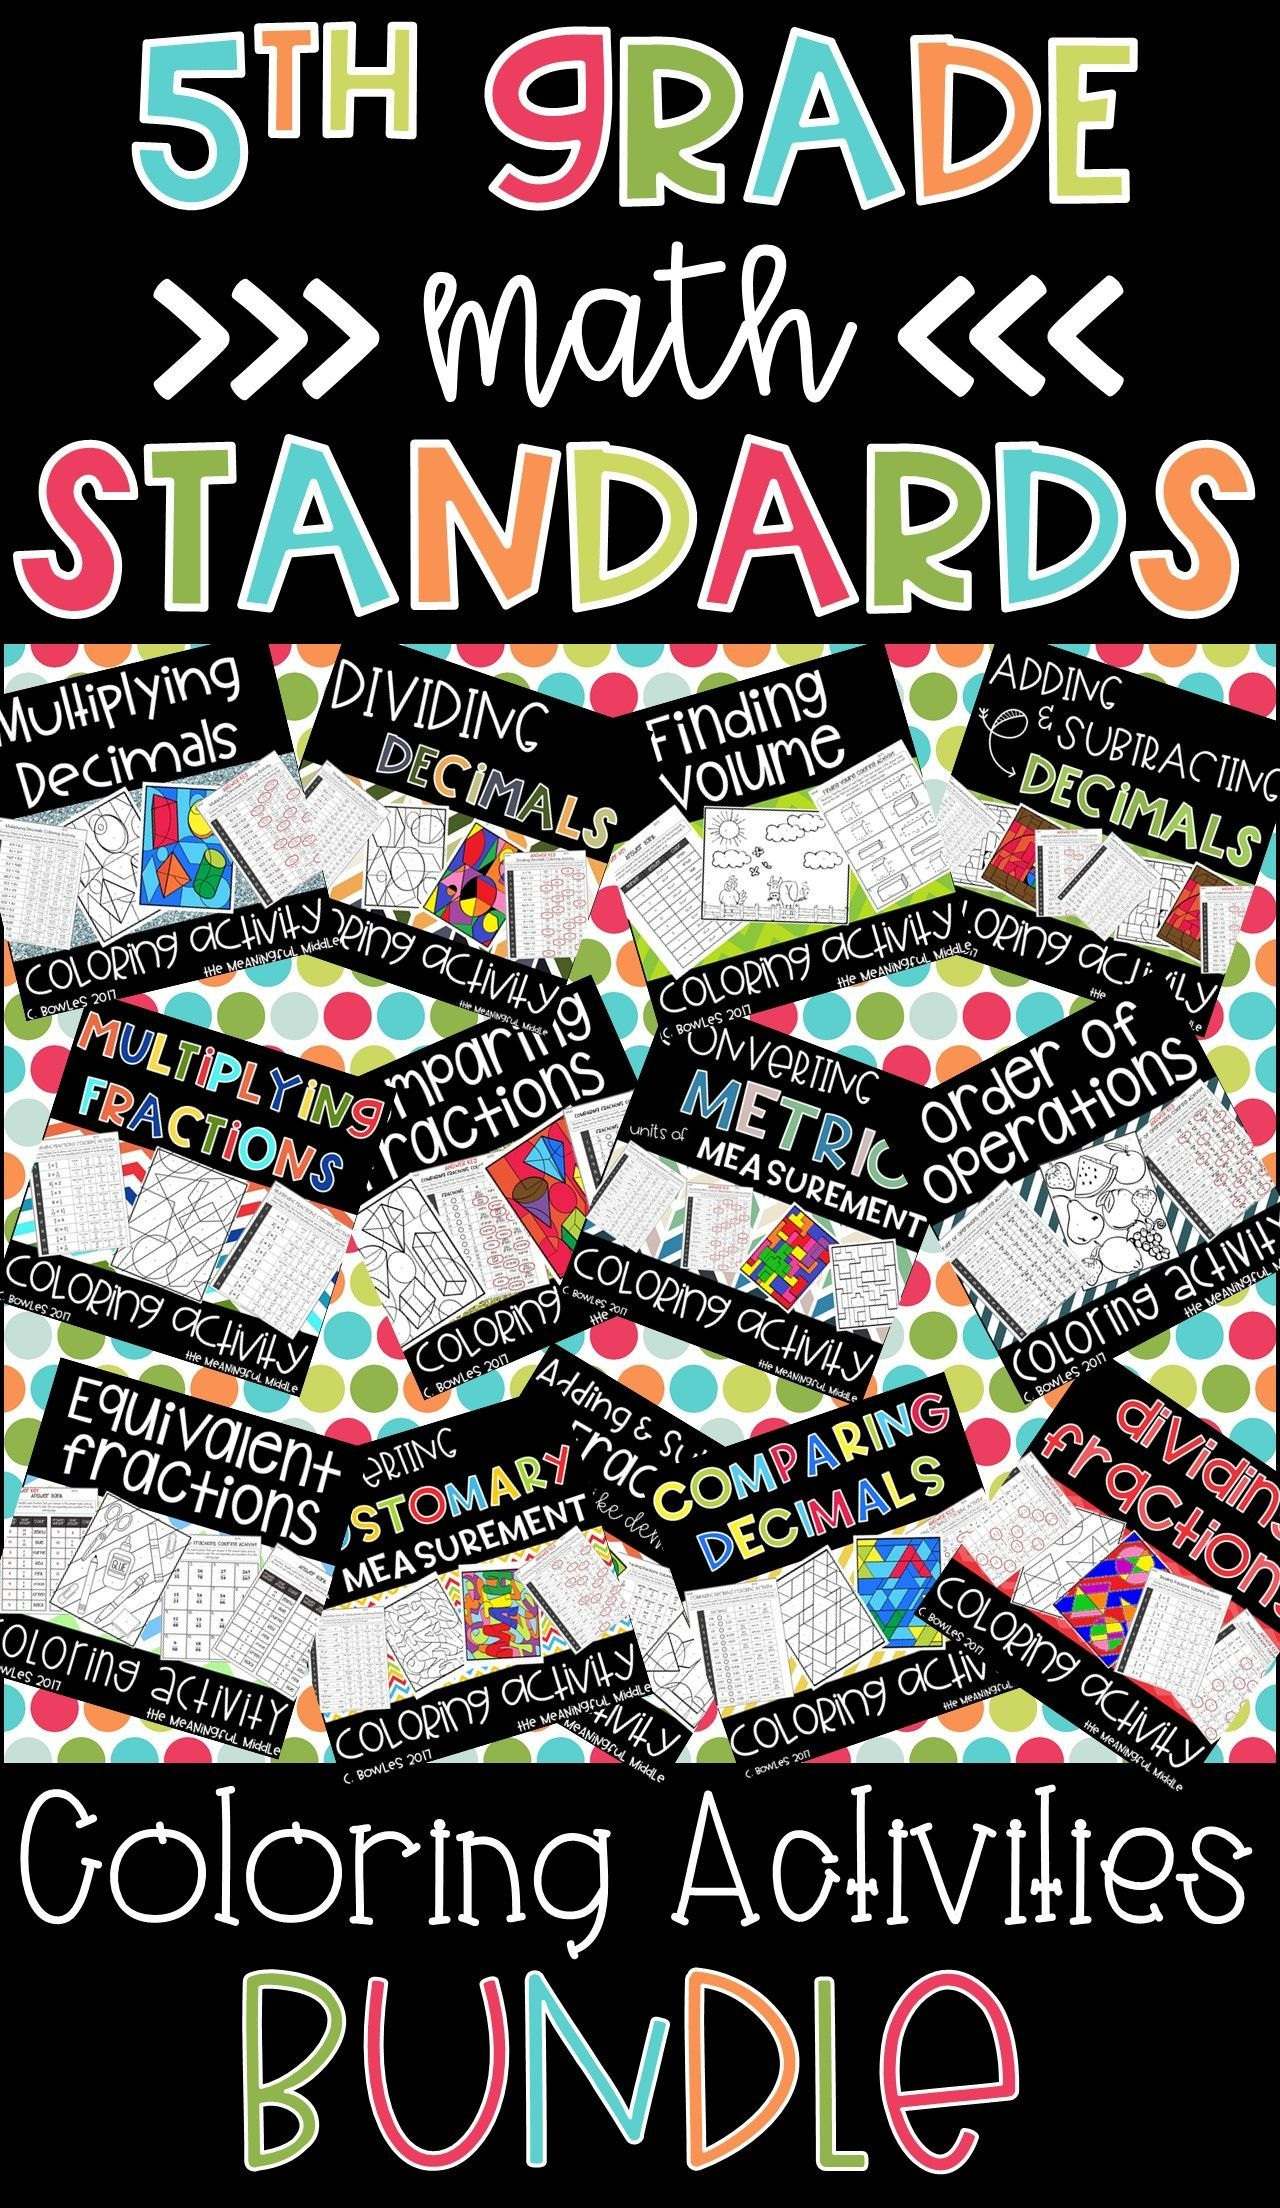 5th Grade Math Standards Coloring Activities Bundle